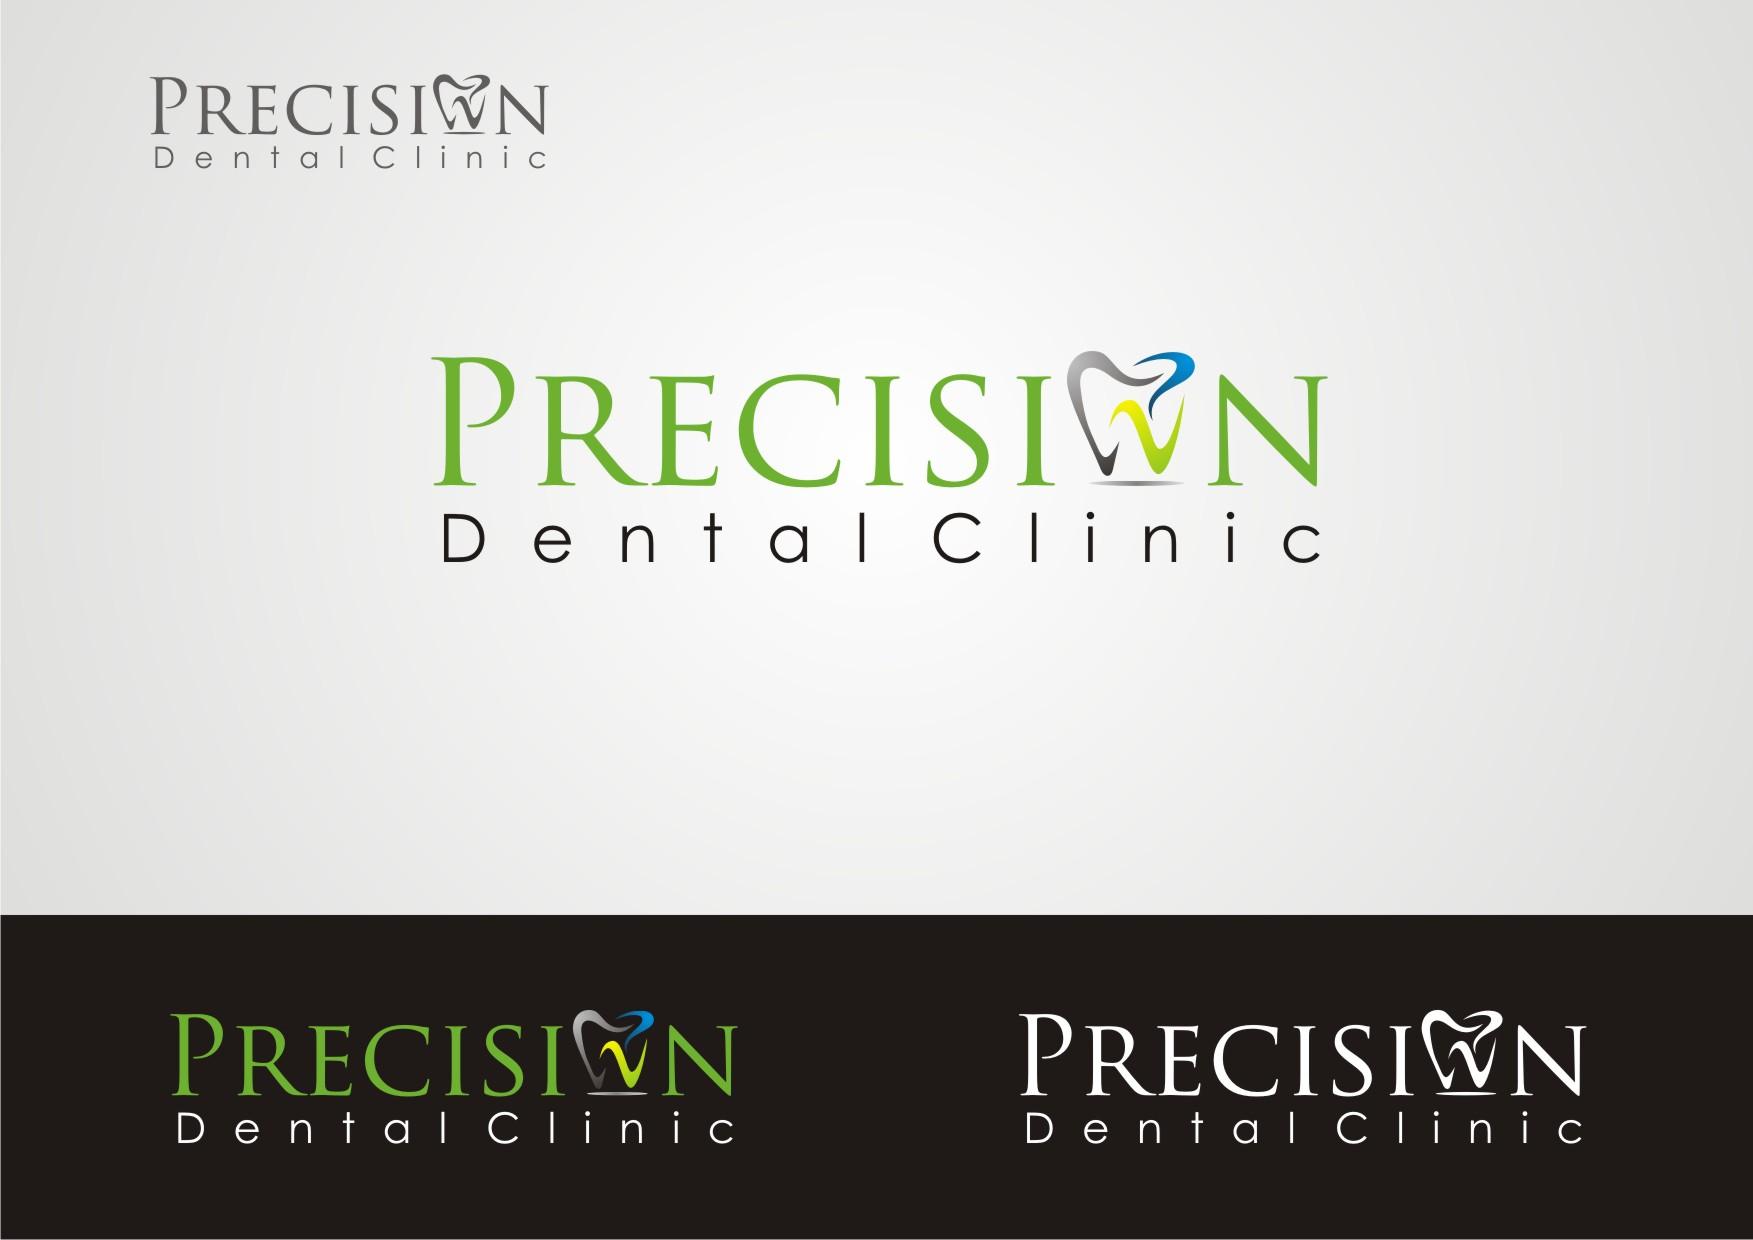 Logo Design by Private User - Entry No. 107 in the Logo Design Contest Captivating Logo Design for Precision Dental Clinic.